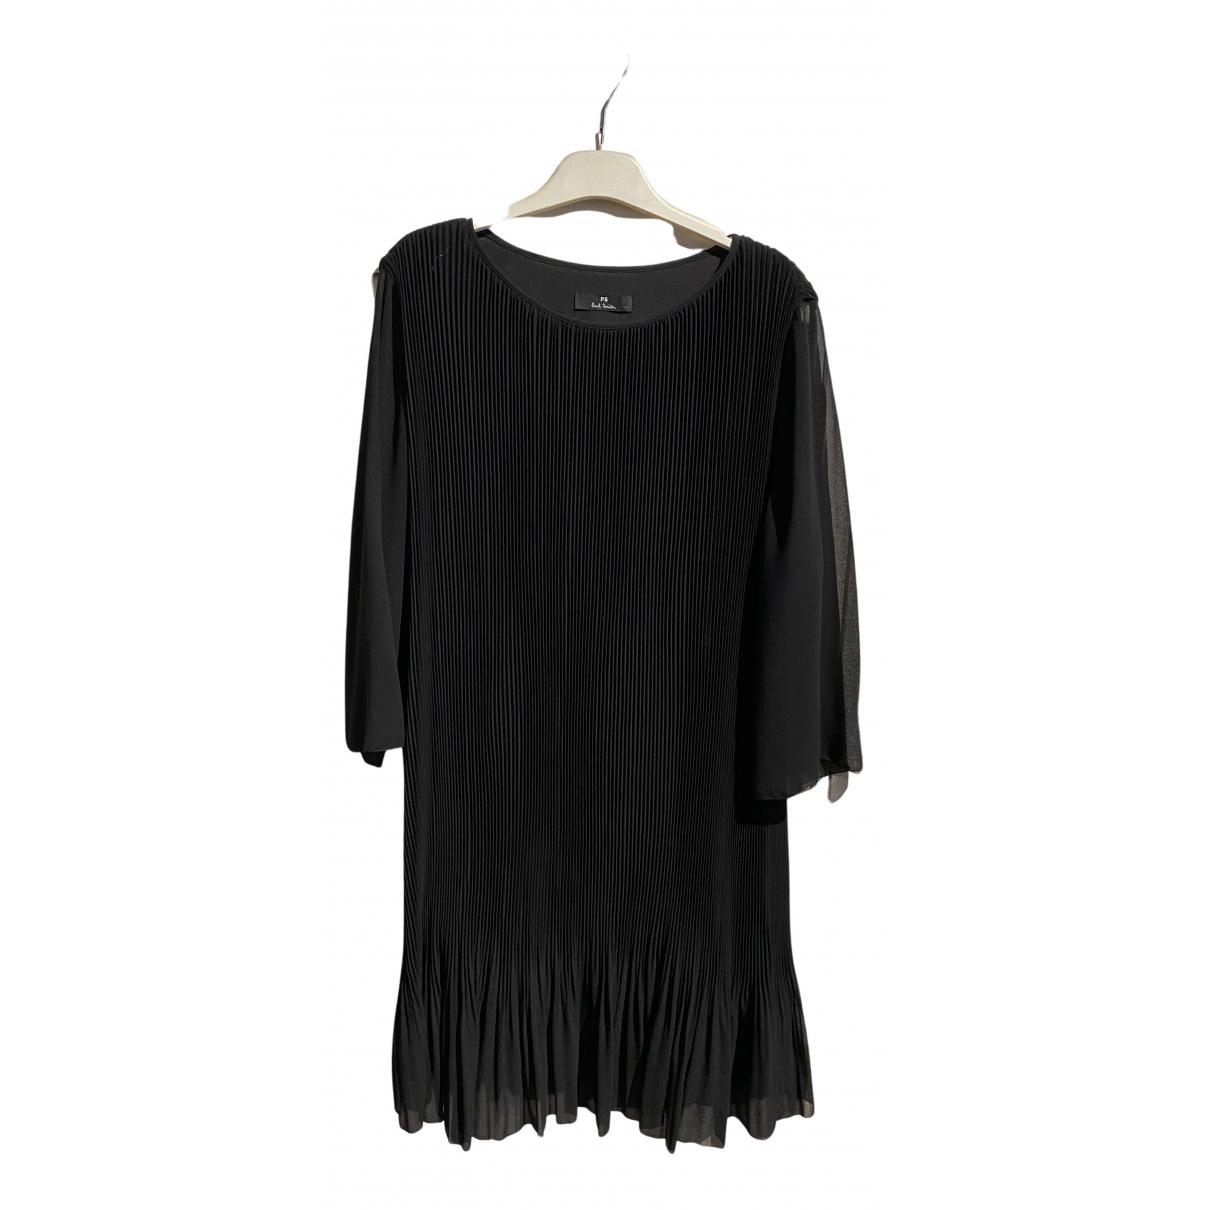 Paul Smith \N Kleid in  Schwarz Polyester